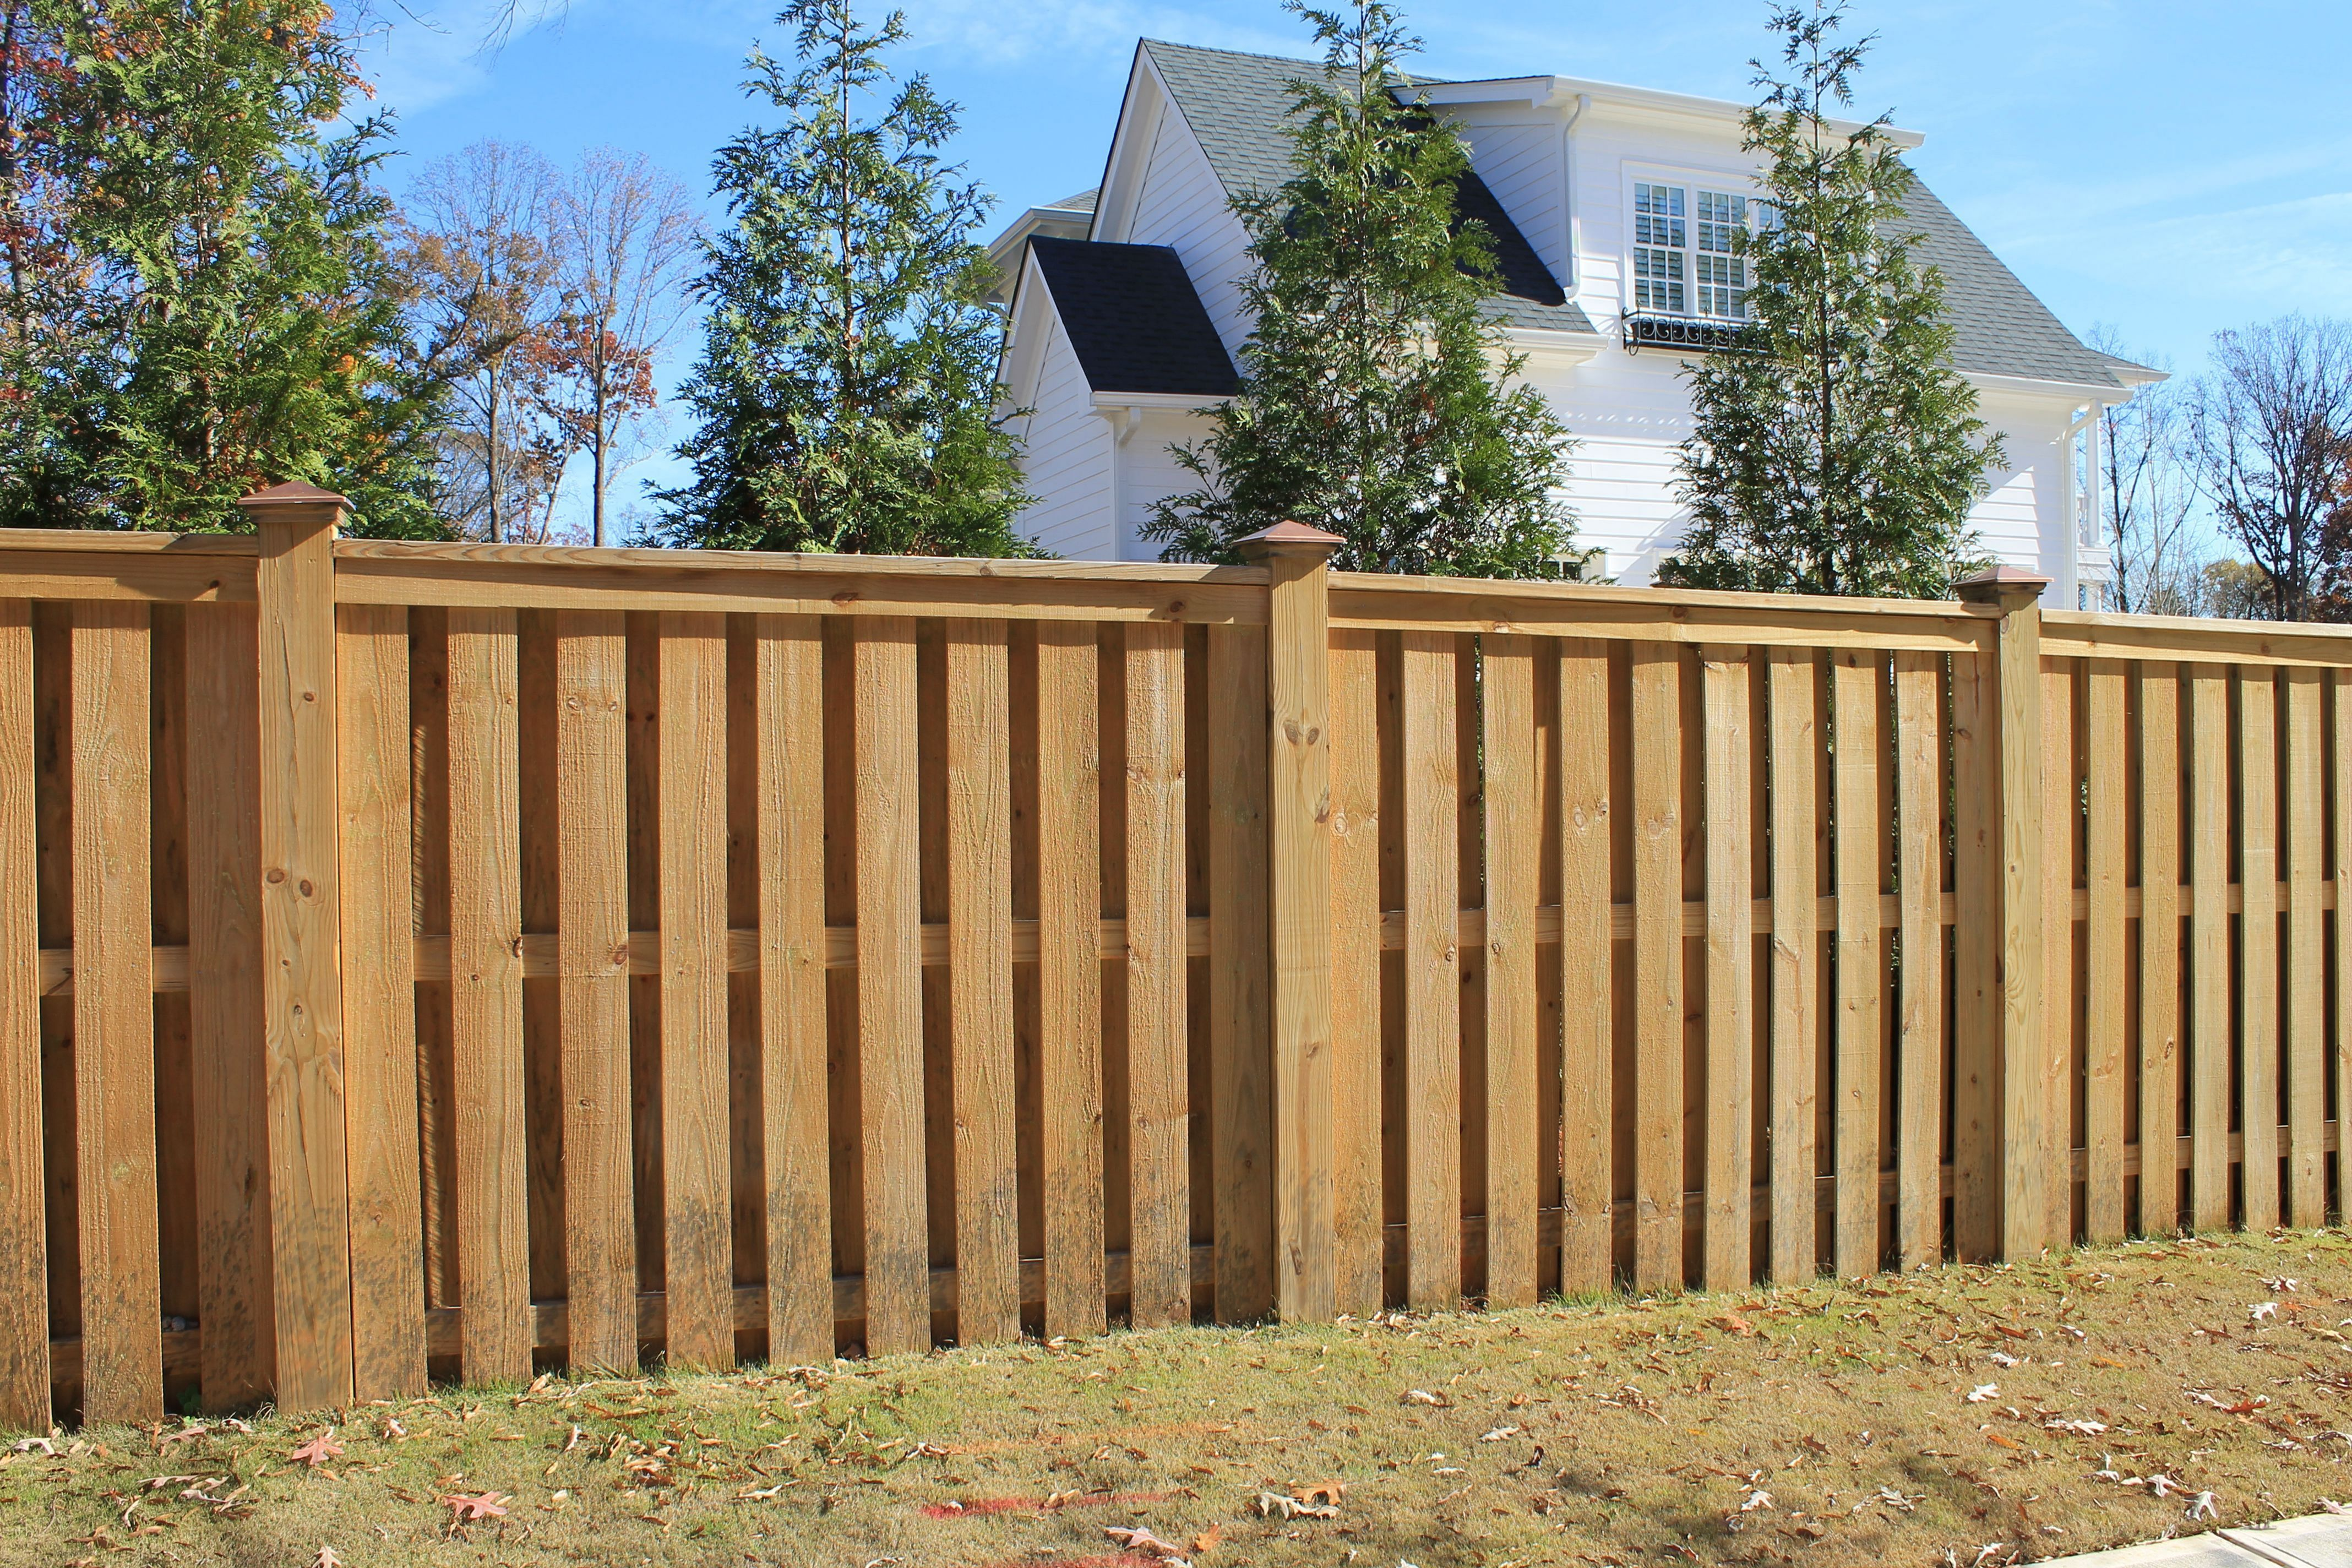 9 Interesting Fence Design Ideas To Make Your Home More Elegant